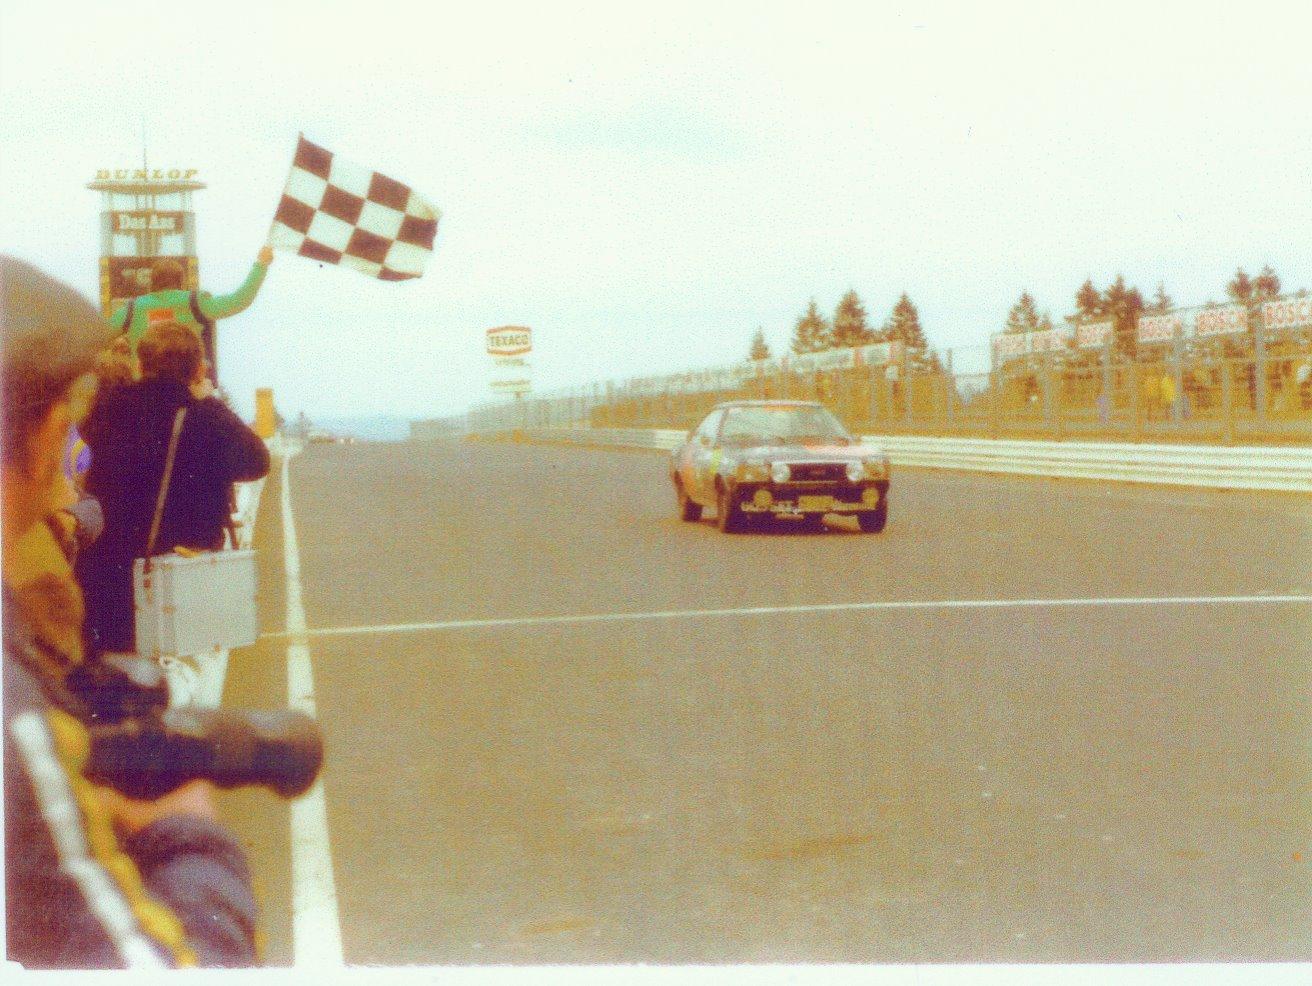 1975 18 Std Nürburgring 3 Clas. gén/ 1 Groupe  Forotti - Feitler - Koob